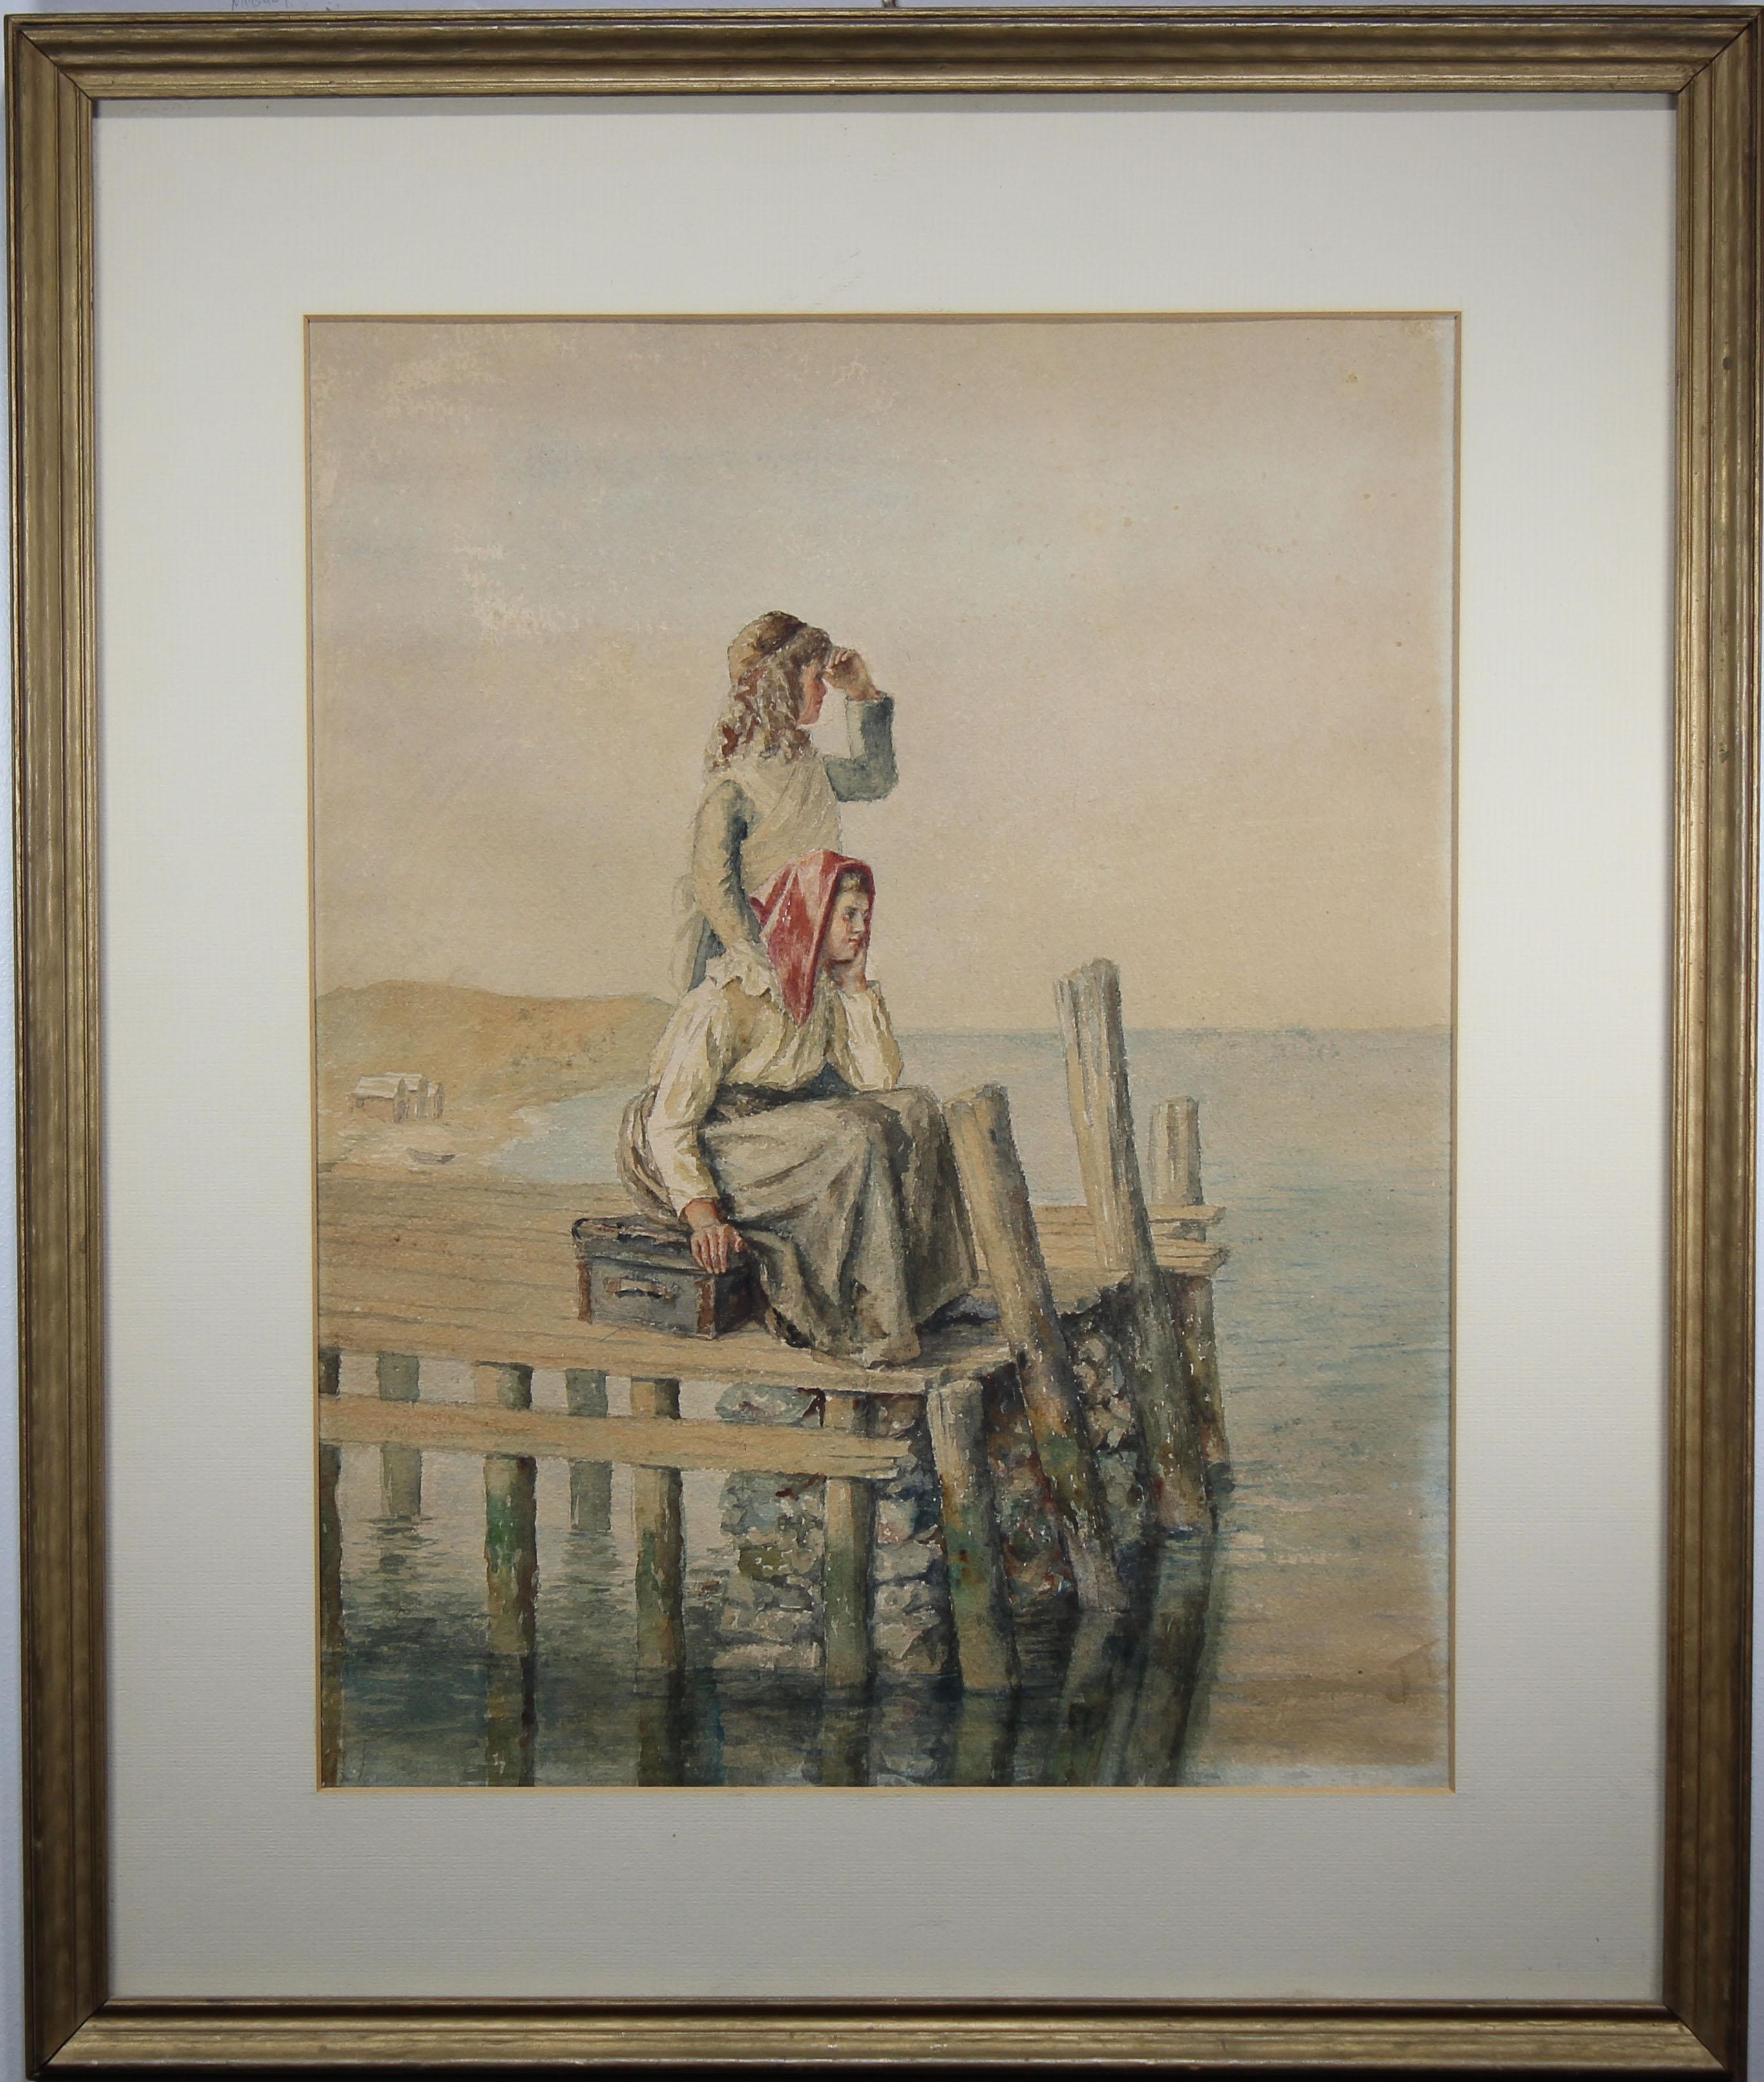 Lot 270 - Signed, 19th C. European School Watercolor